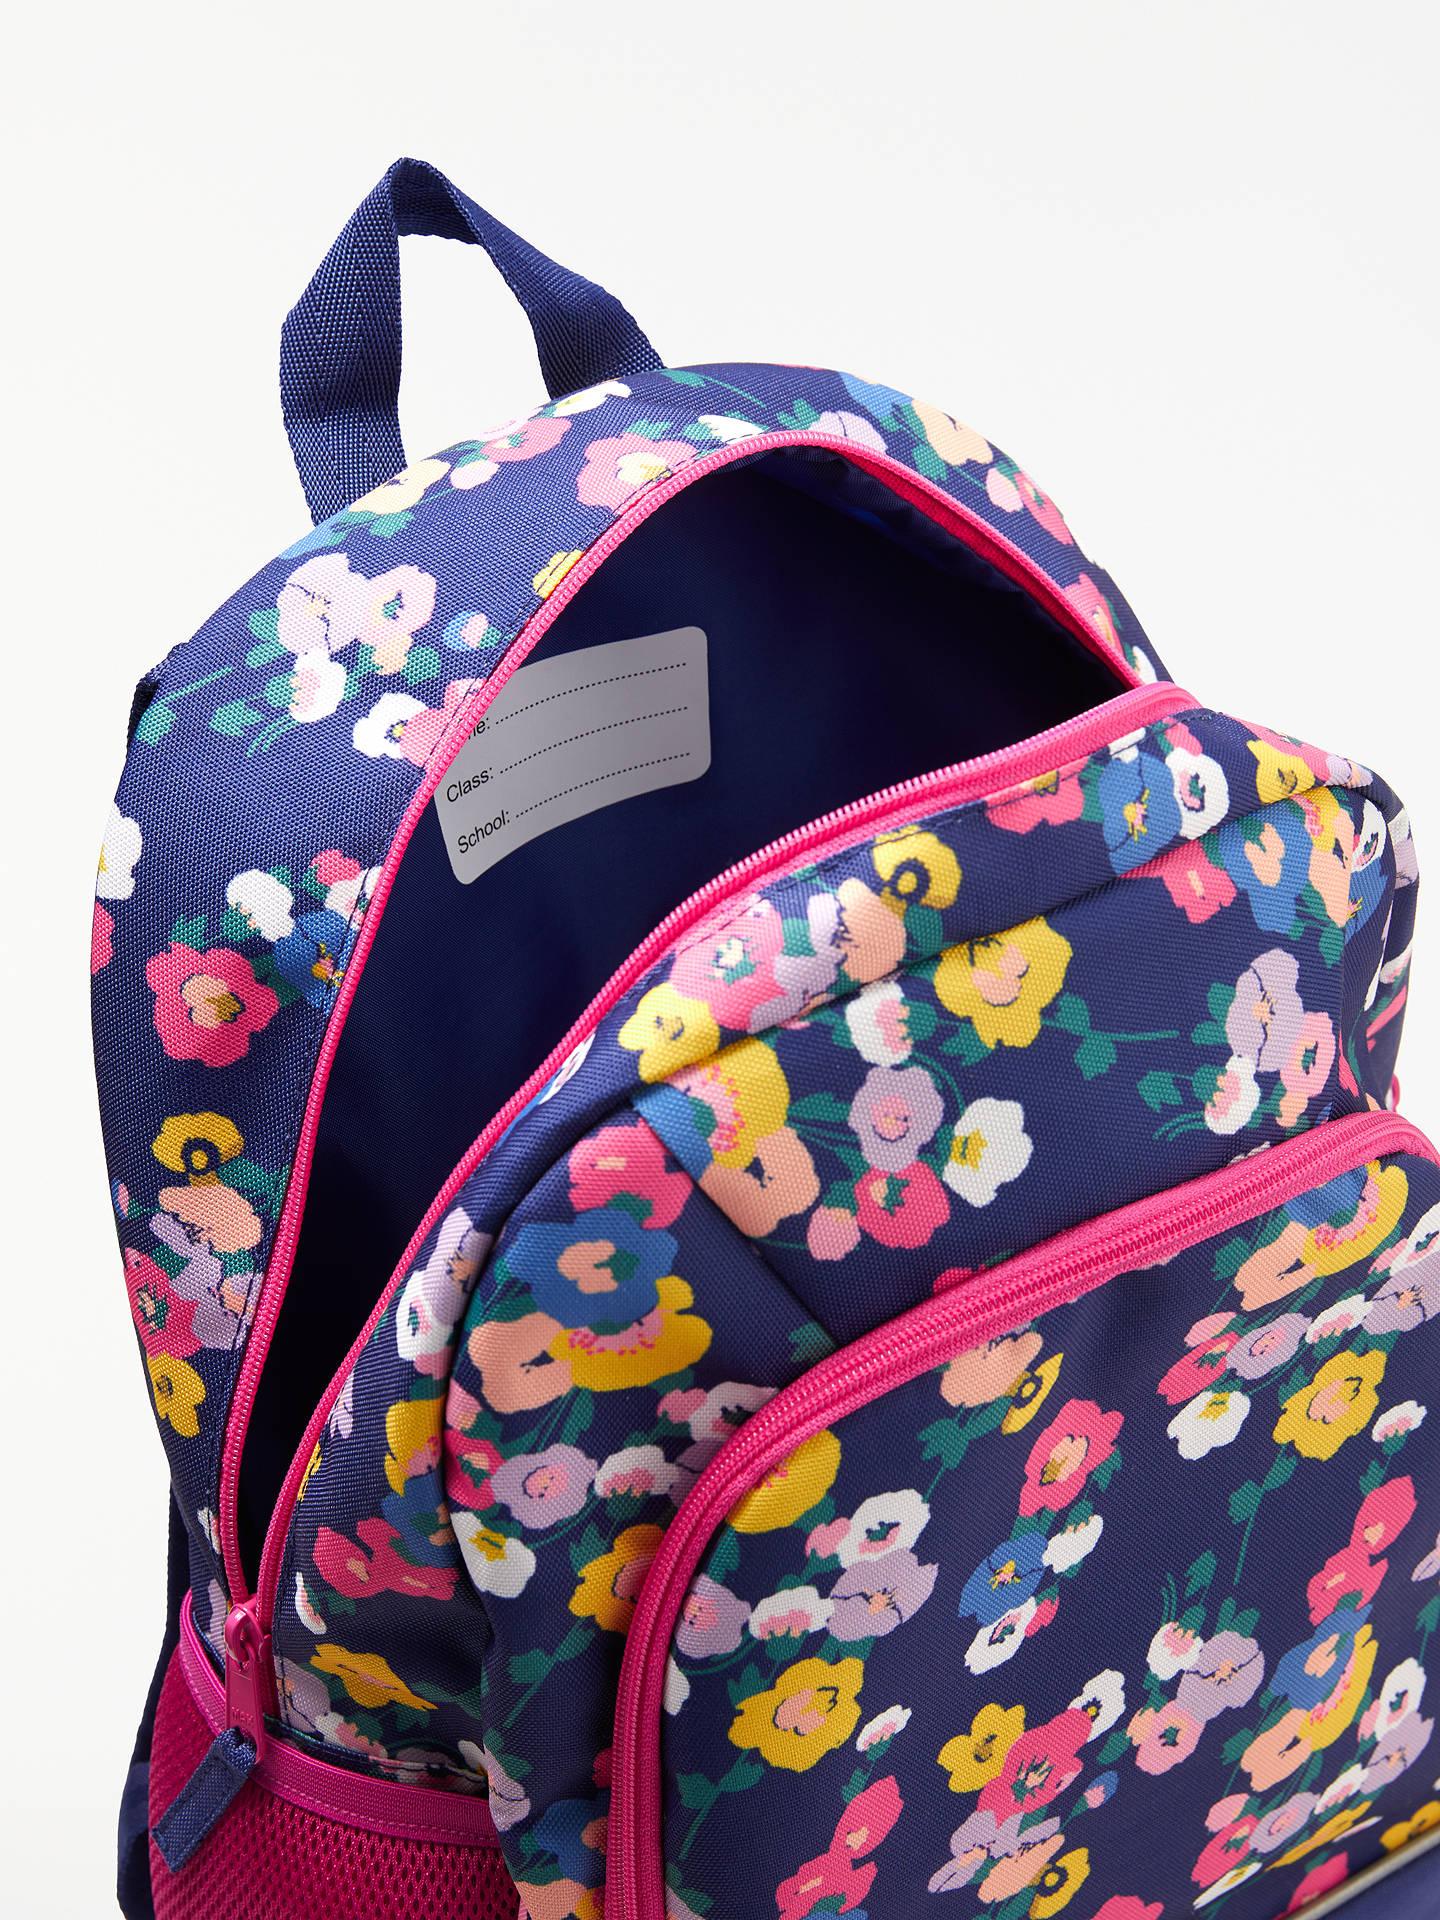 3a2fae9761 ... Buy John Lewis & Partners Children's Floral Print Backpack, NavyMulti  Online at johnlewis. ...